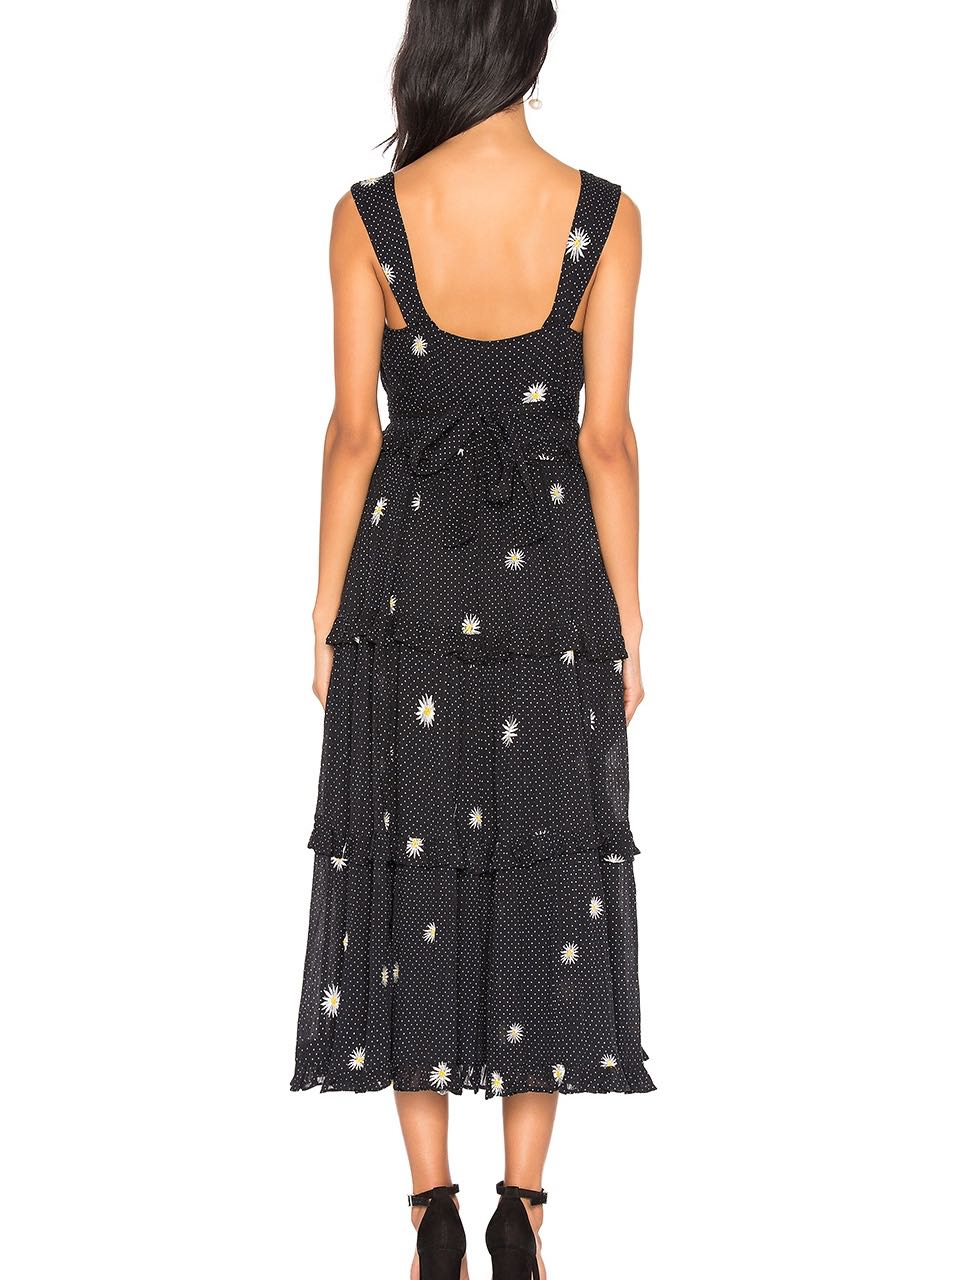 Free People Daisy Chain Embroidery Midi Dress Black